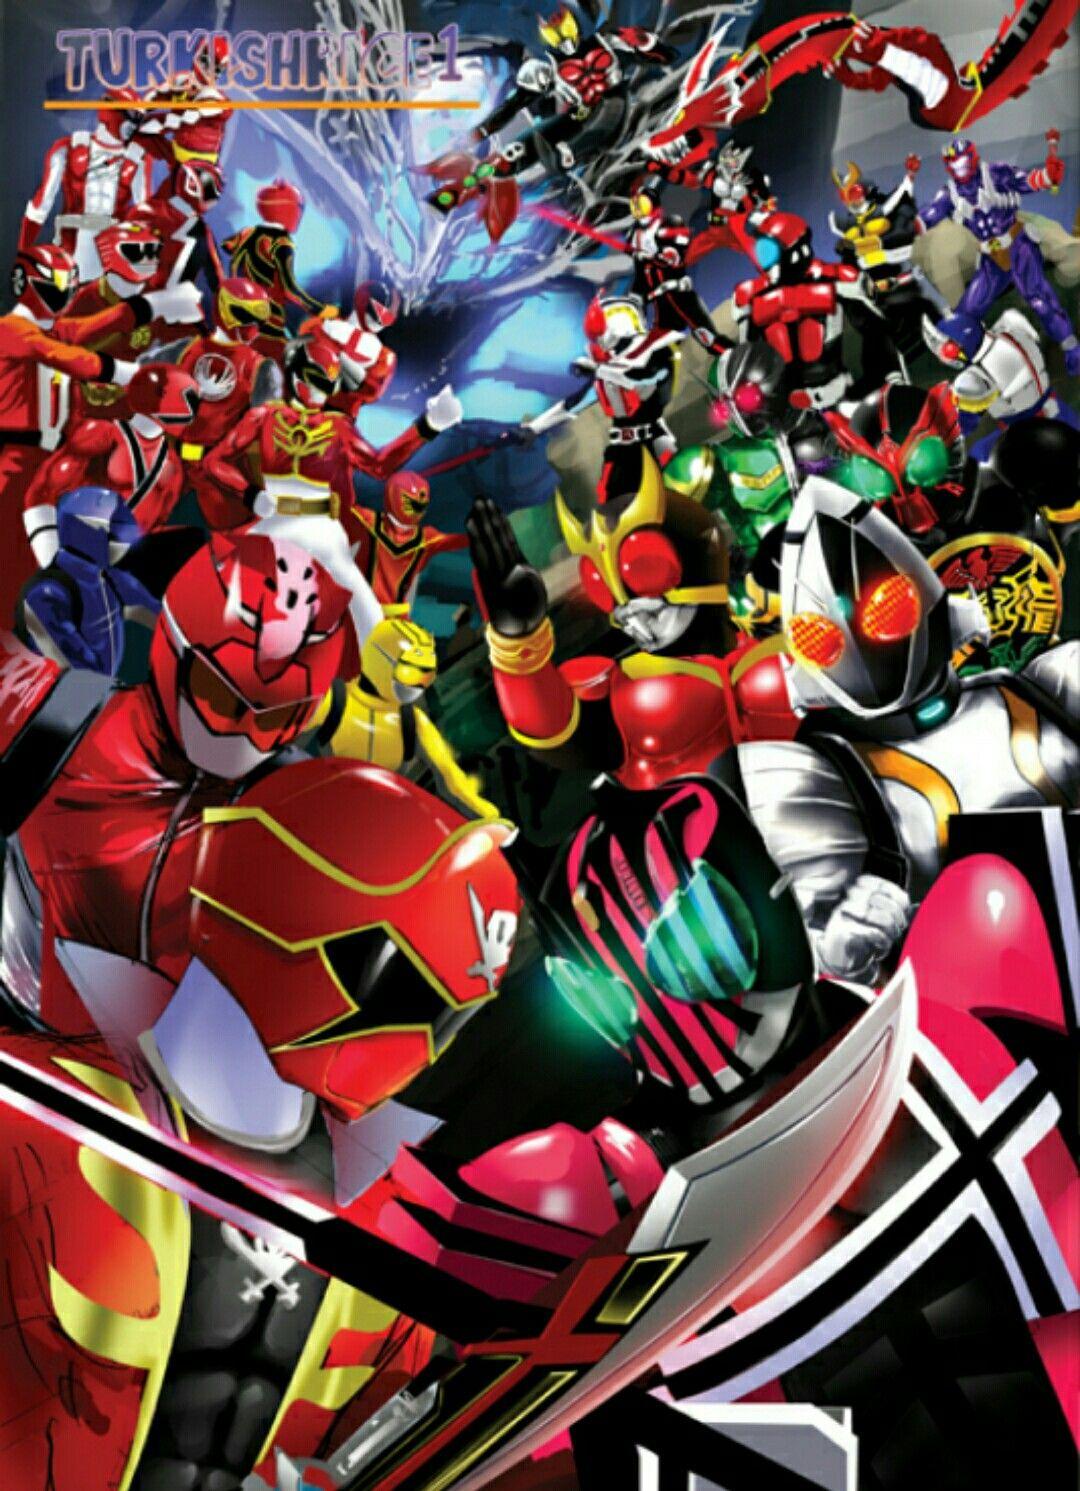 Kamen Rider Vs Super Sentai Kamen Rider Decade Kamen Rider Power Rangers